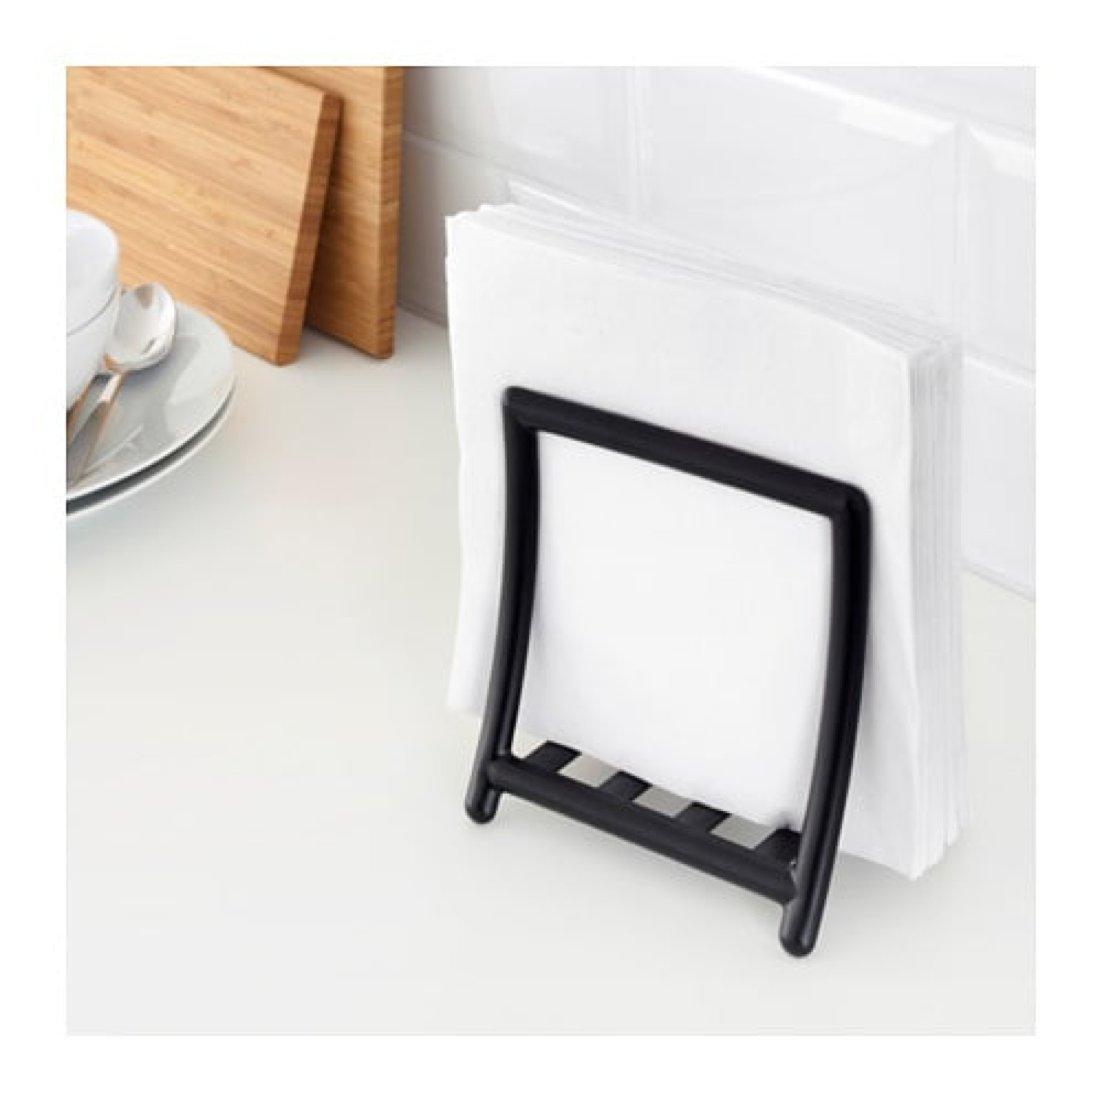 Ikea Greja Napkin Holder Black 503.428.50